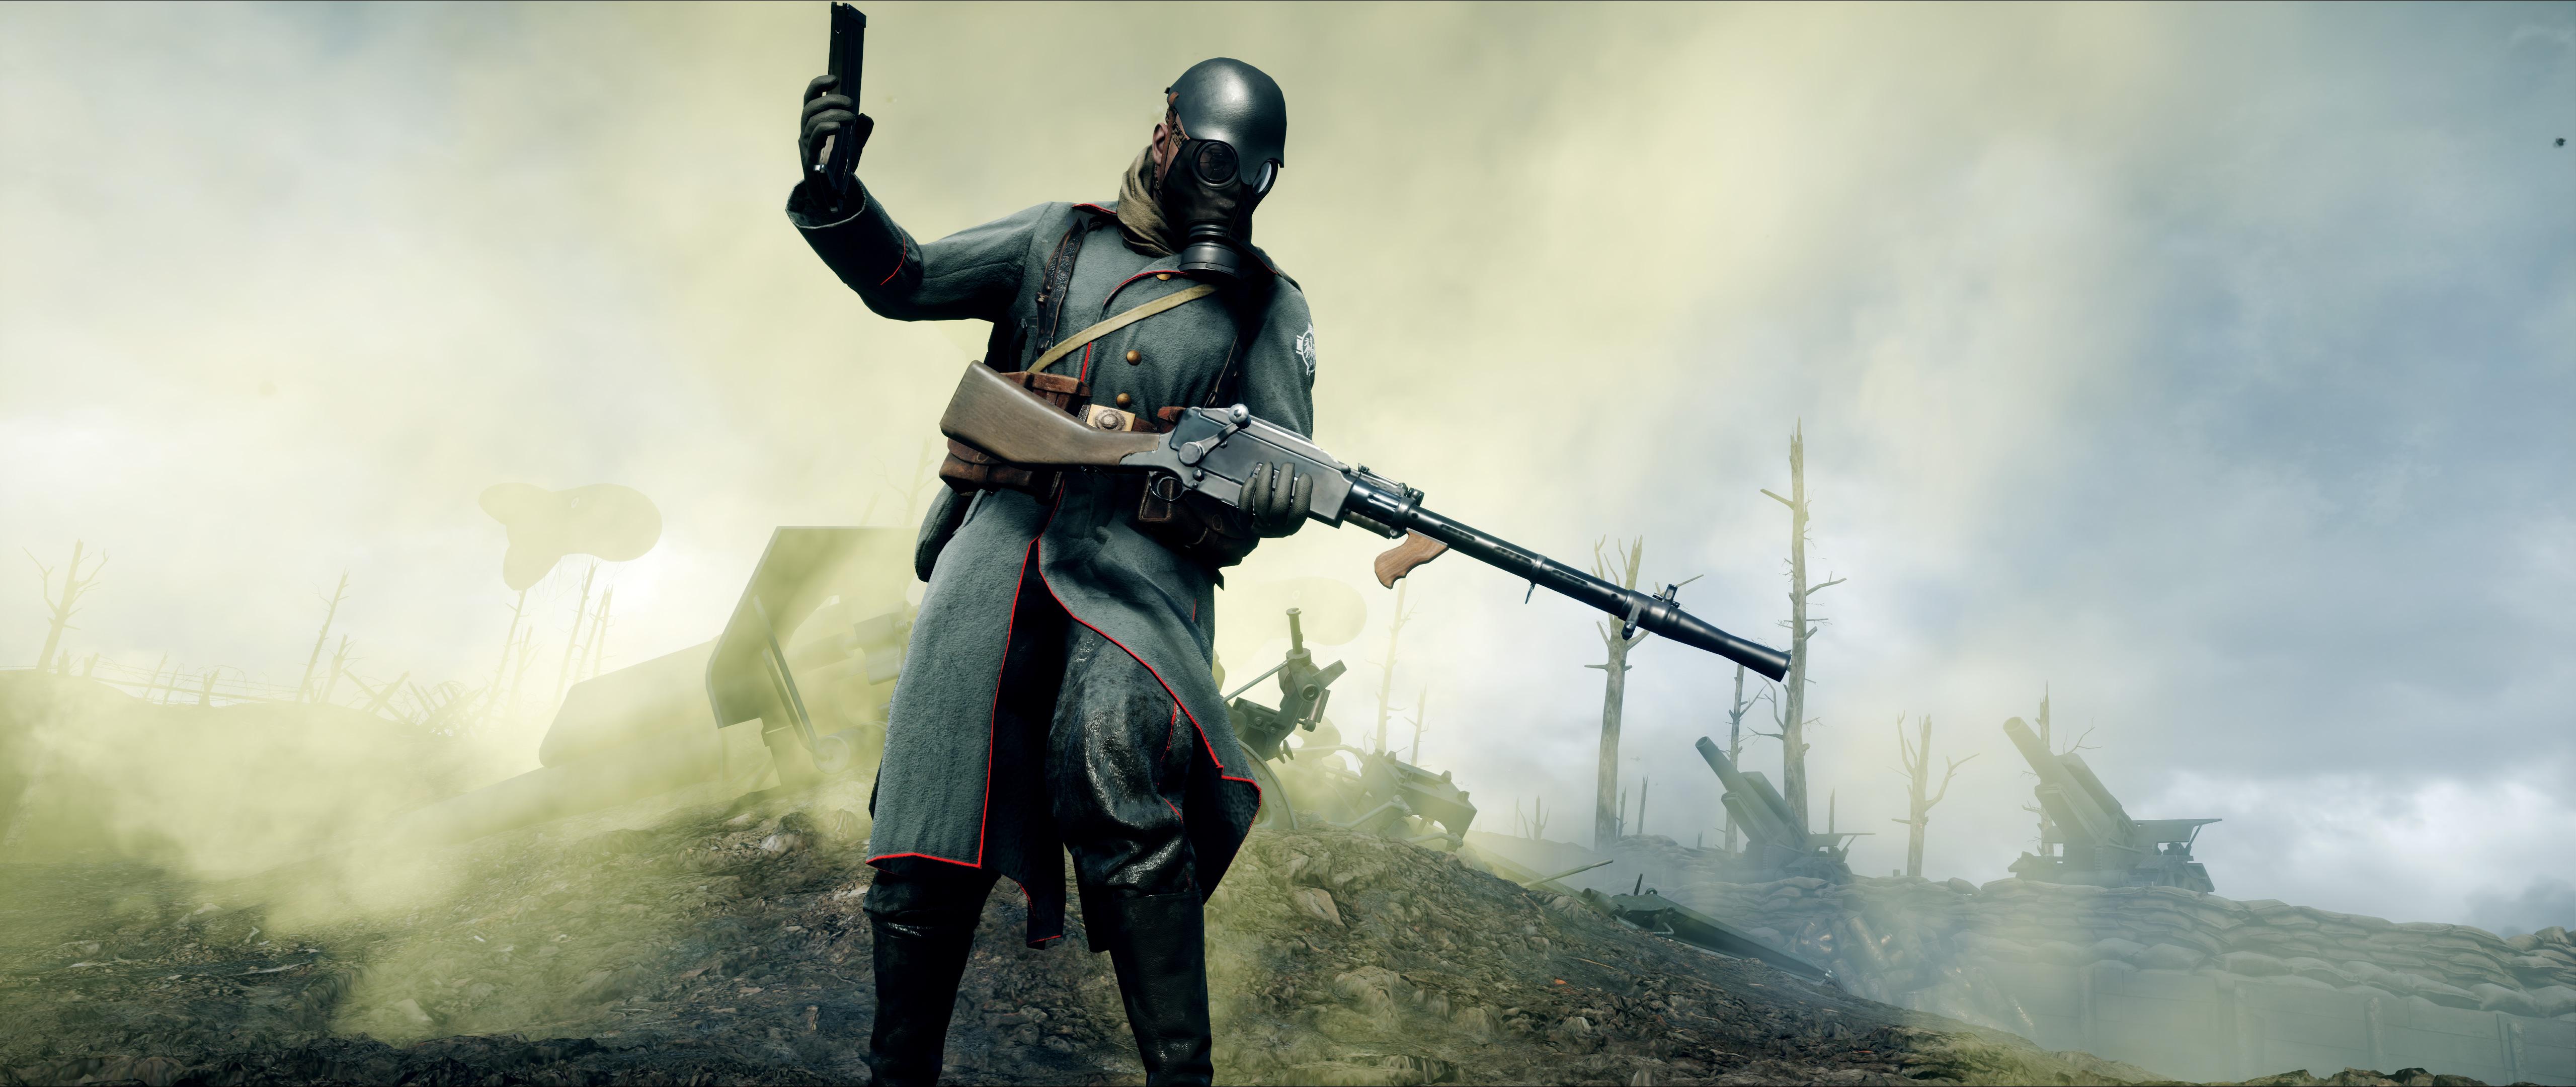 Battlefield 1 Wallpapers   HD Wallpapers